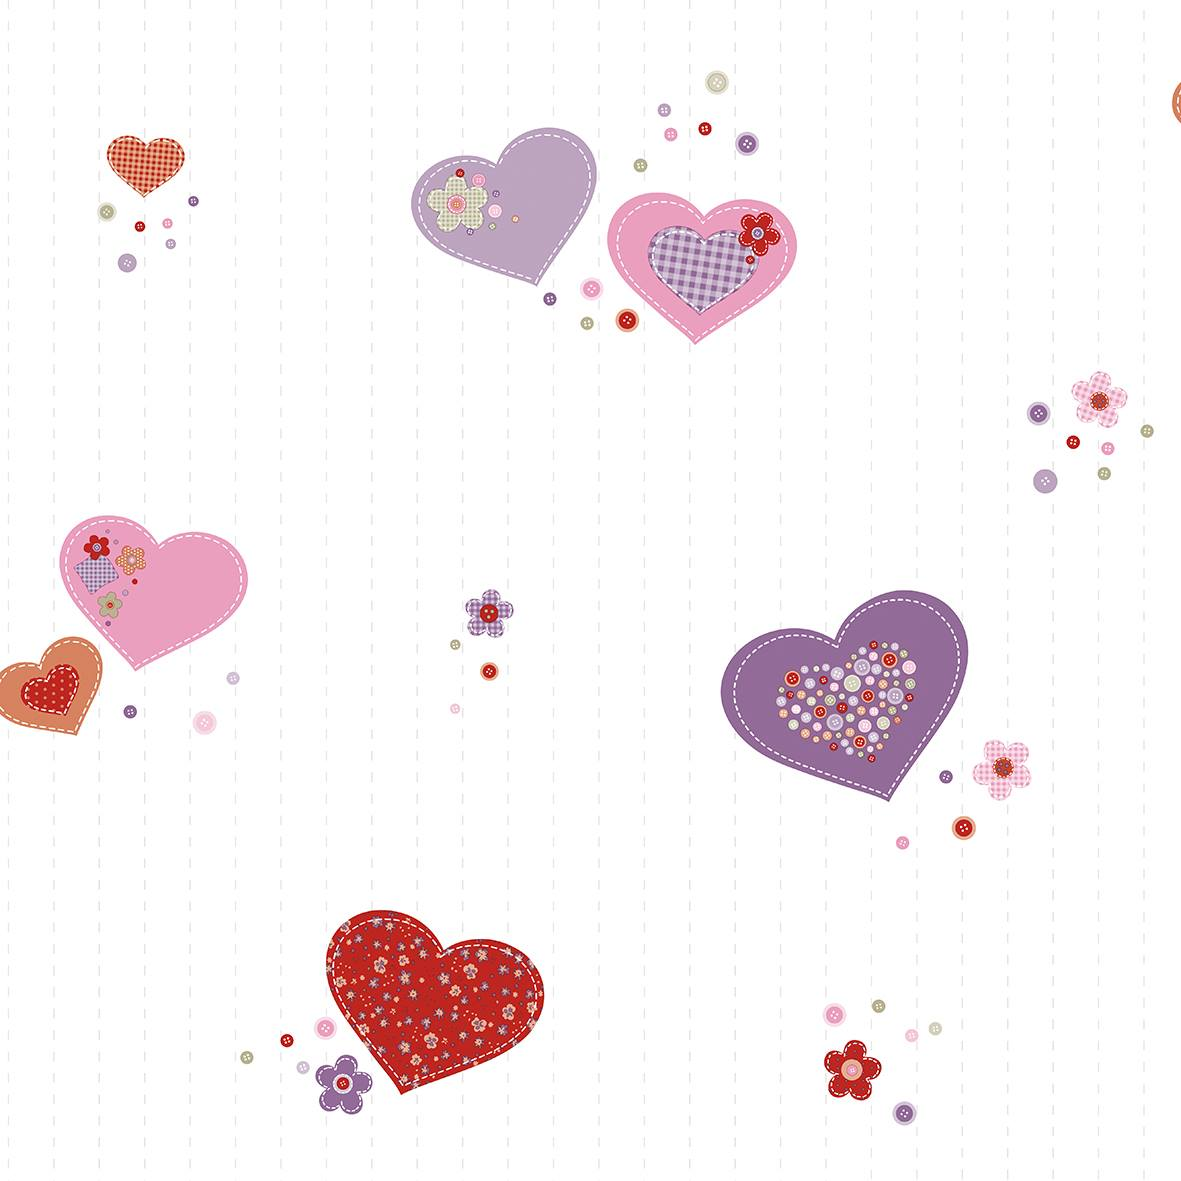 Papel de Parede Ola Baby 2 Corações OL220301R - Rolo: 10m x 0,53m